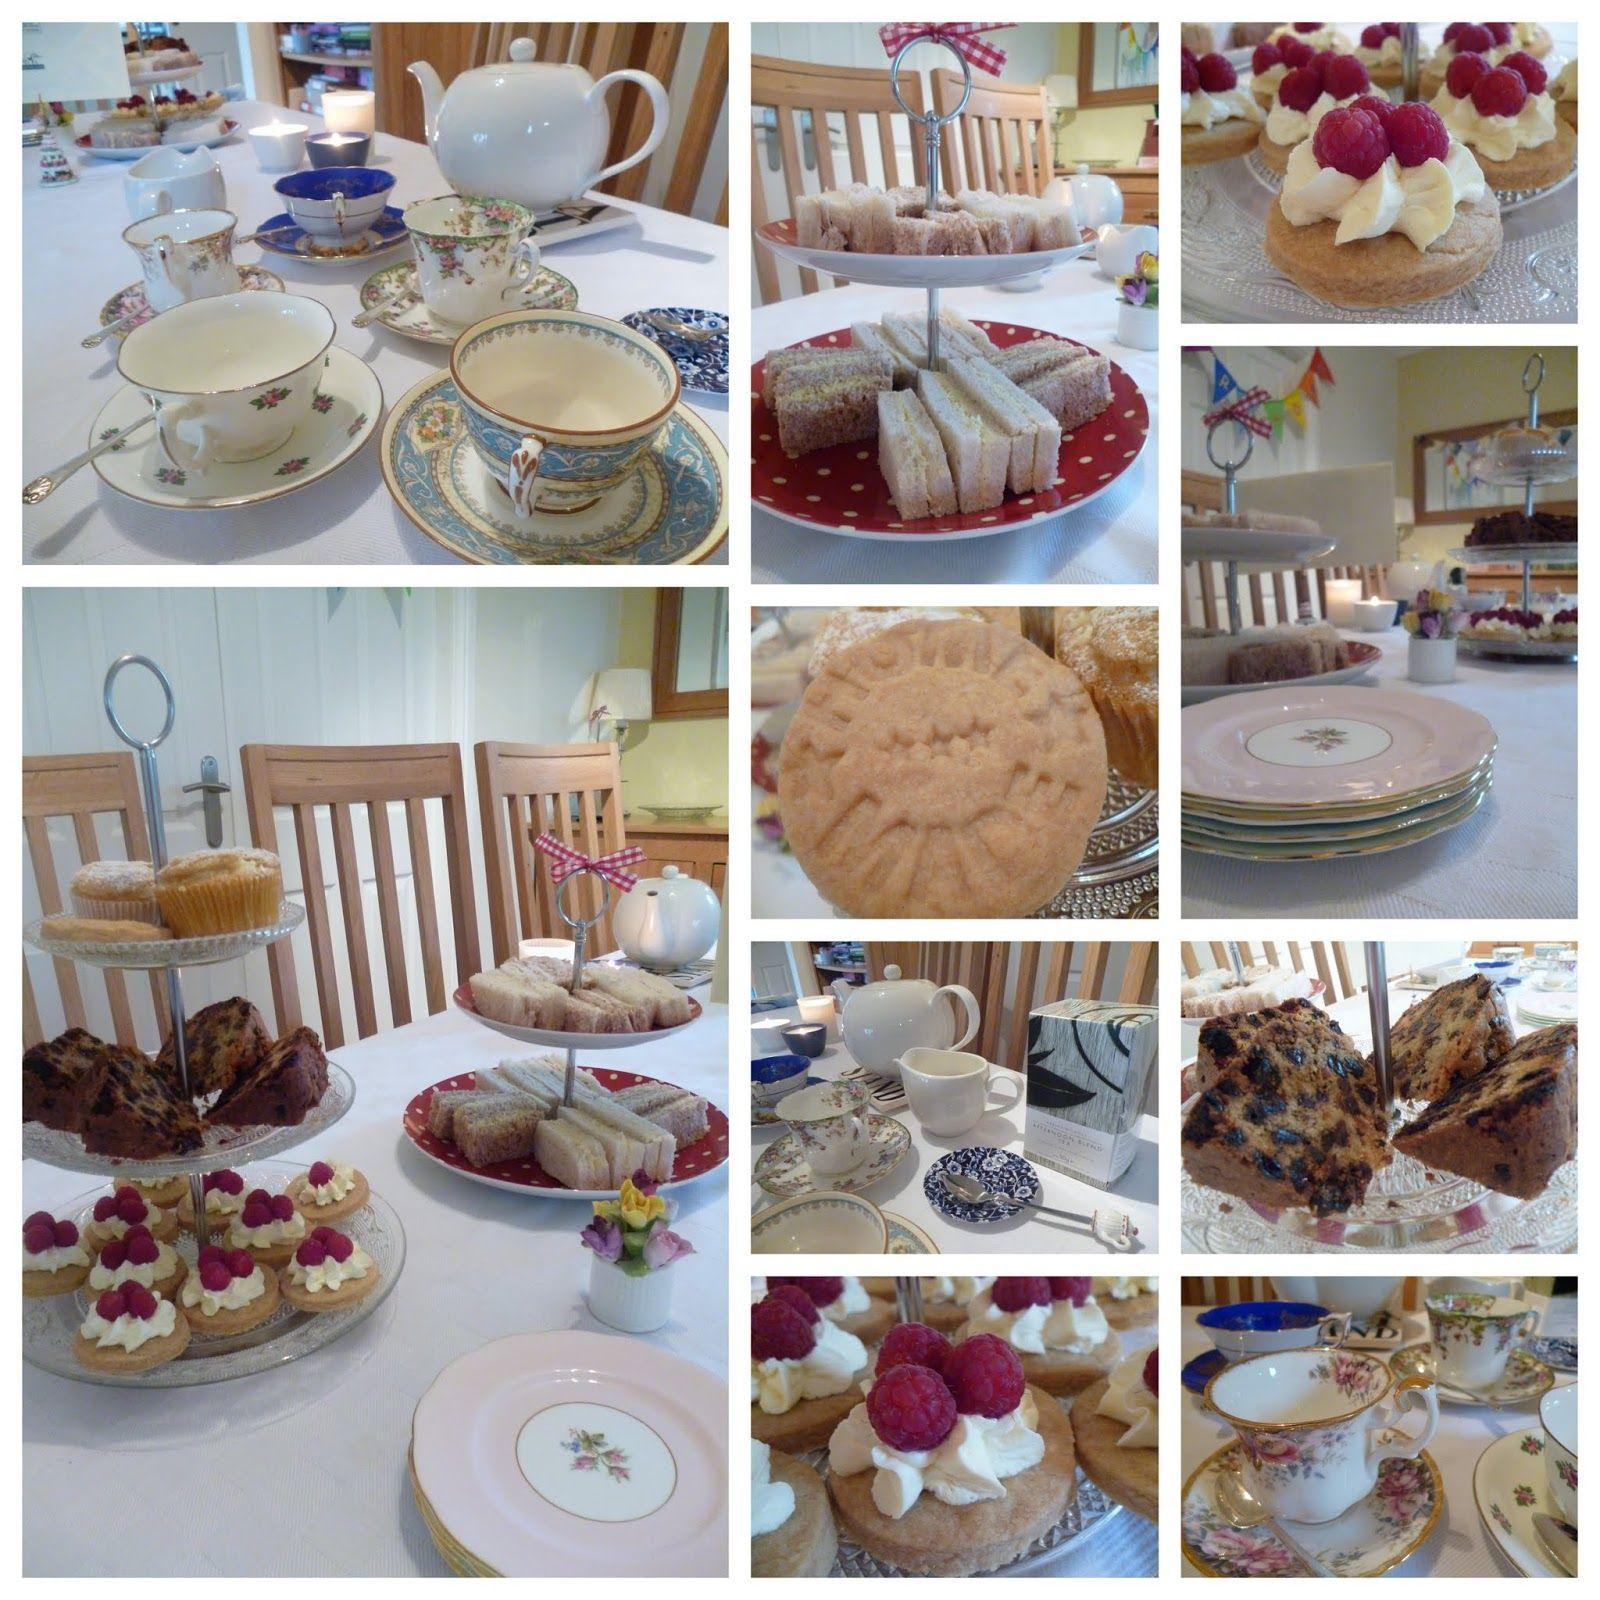 Garden, Tea, Cakes and Me Homemade Afternoon Tea a